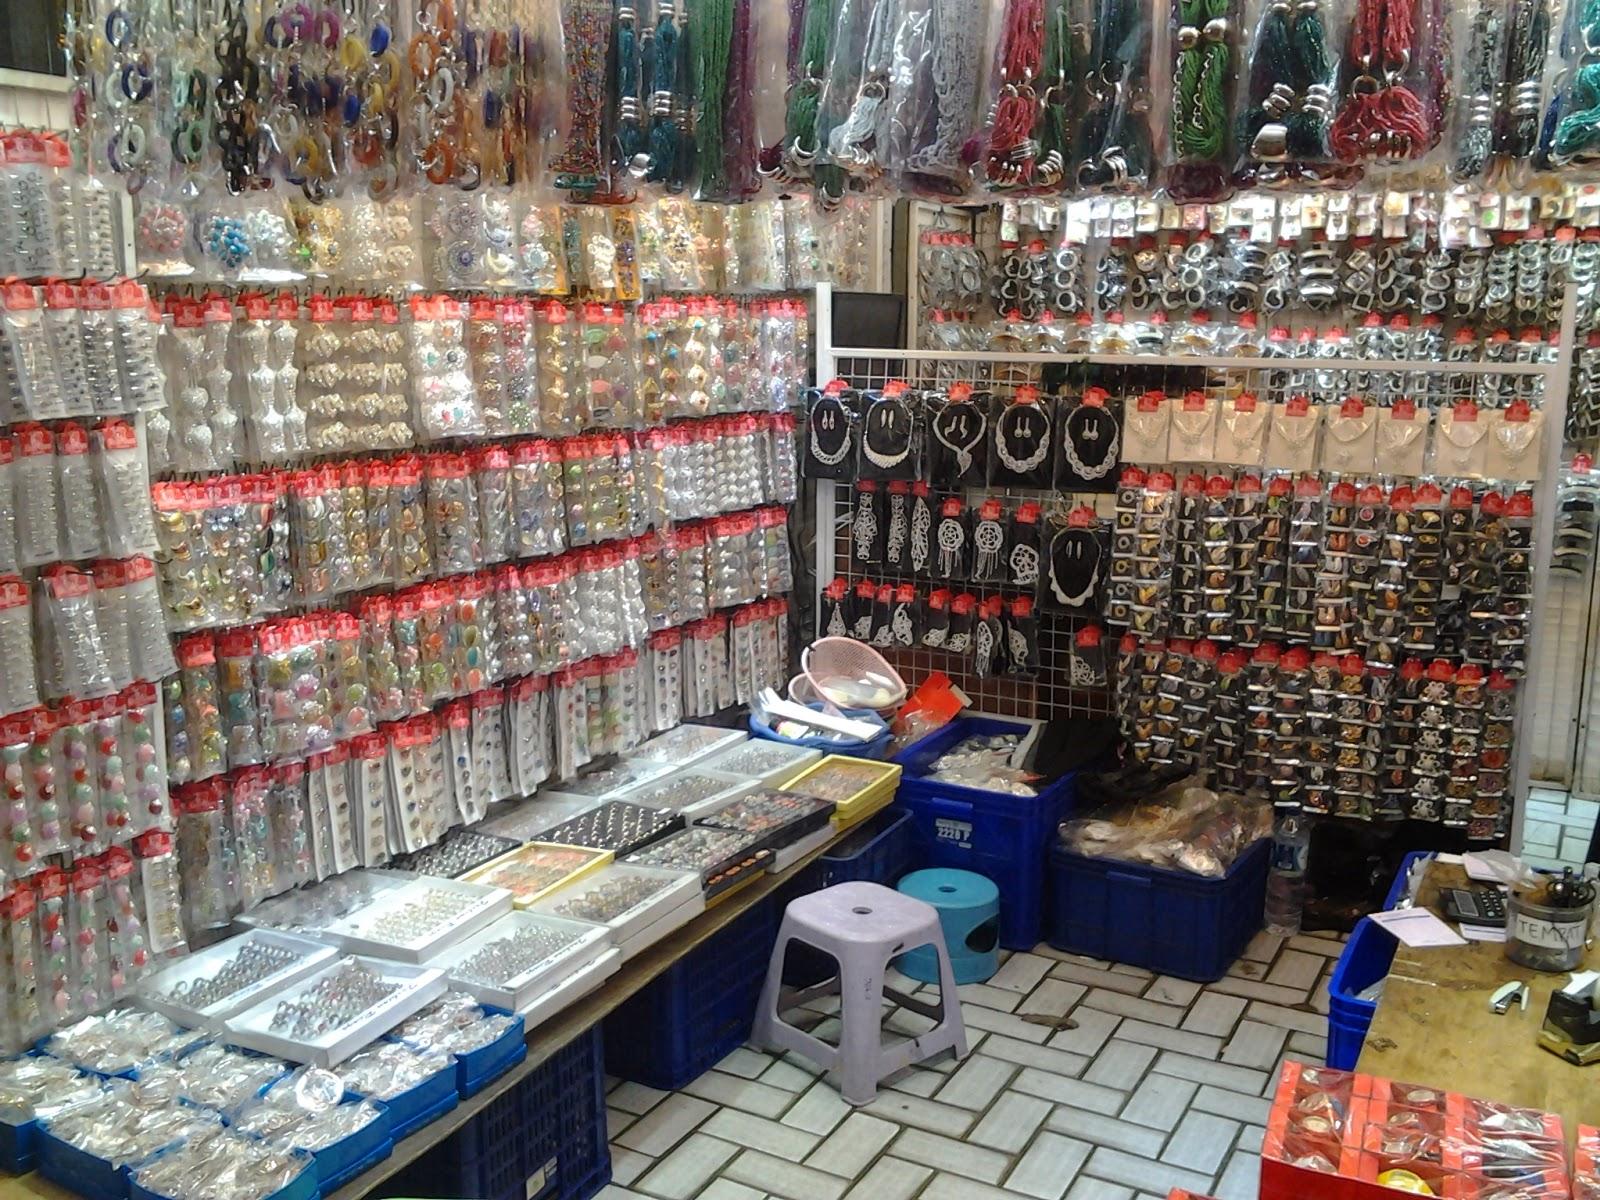 Selvy Erline Wisata Kota Tua Pasar Asemka